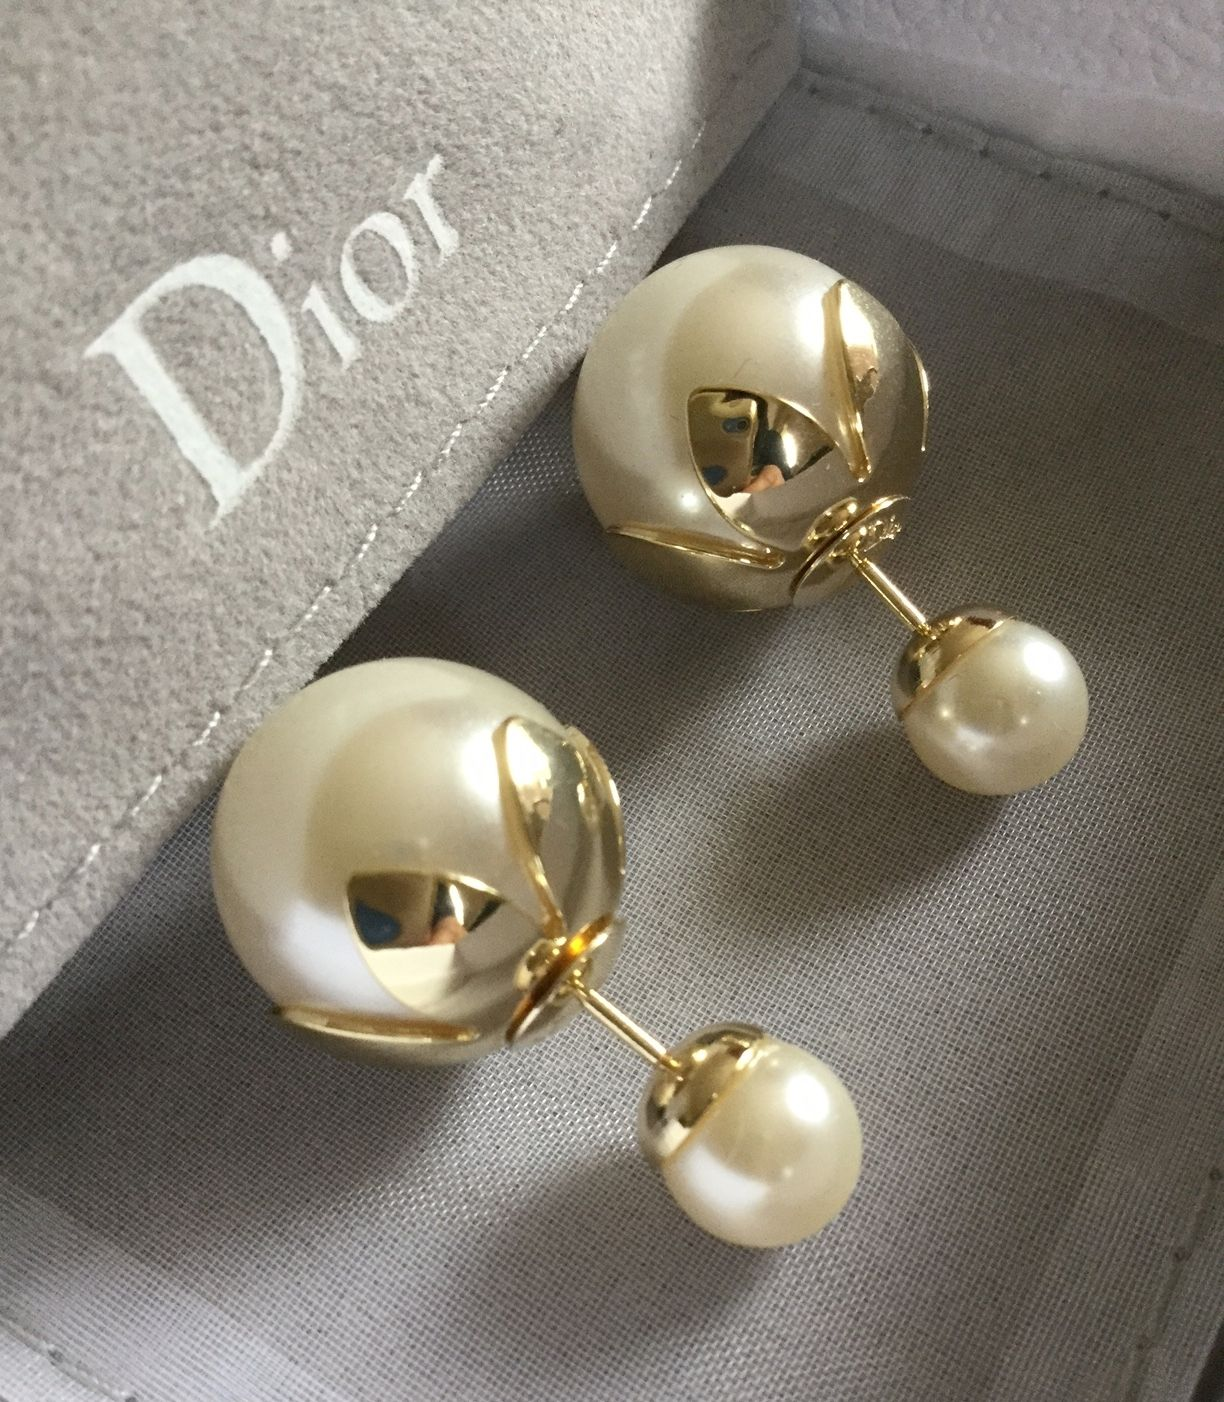 f9f988683a9d5e DIOR TRIBALE Mise en Dior Tribal Earrings GOLDEN TULIP Flower Petal  Authentic